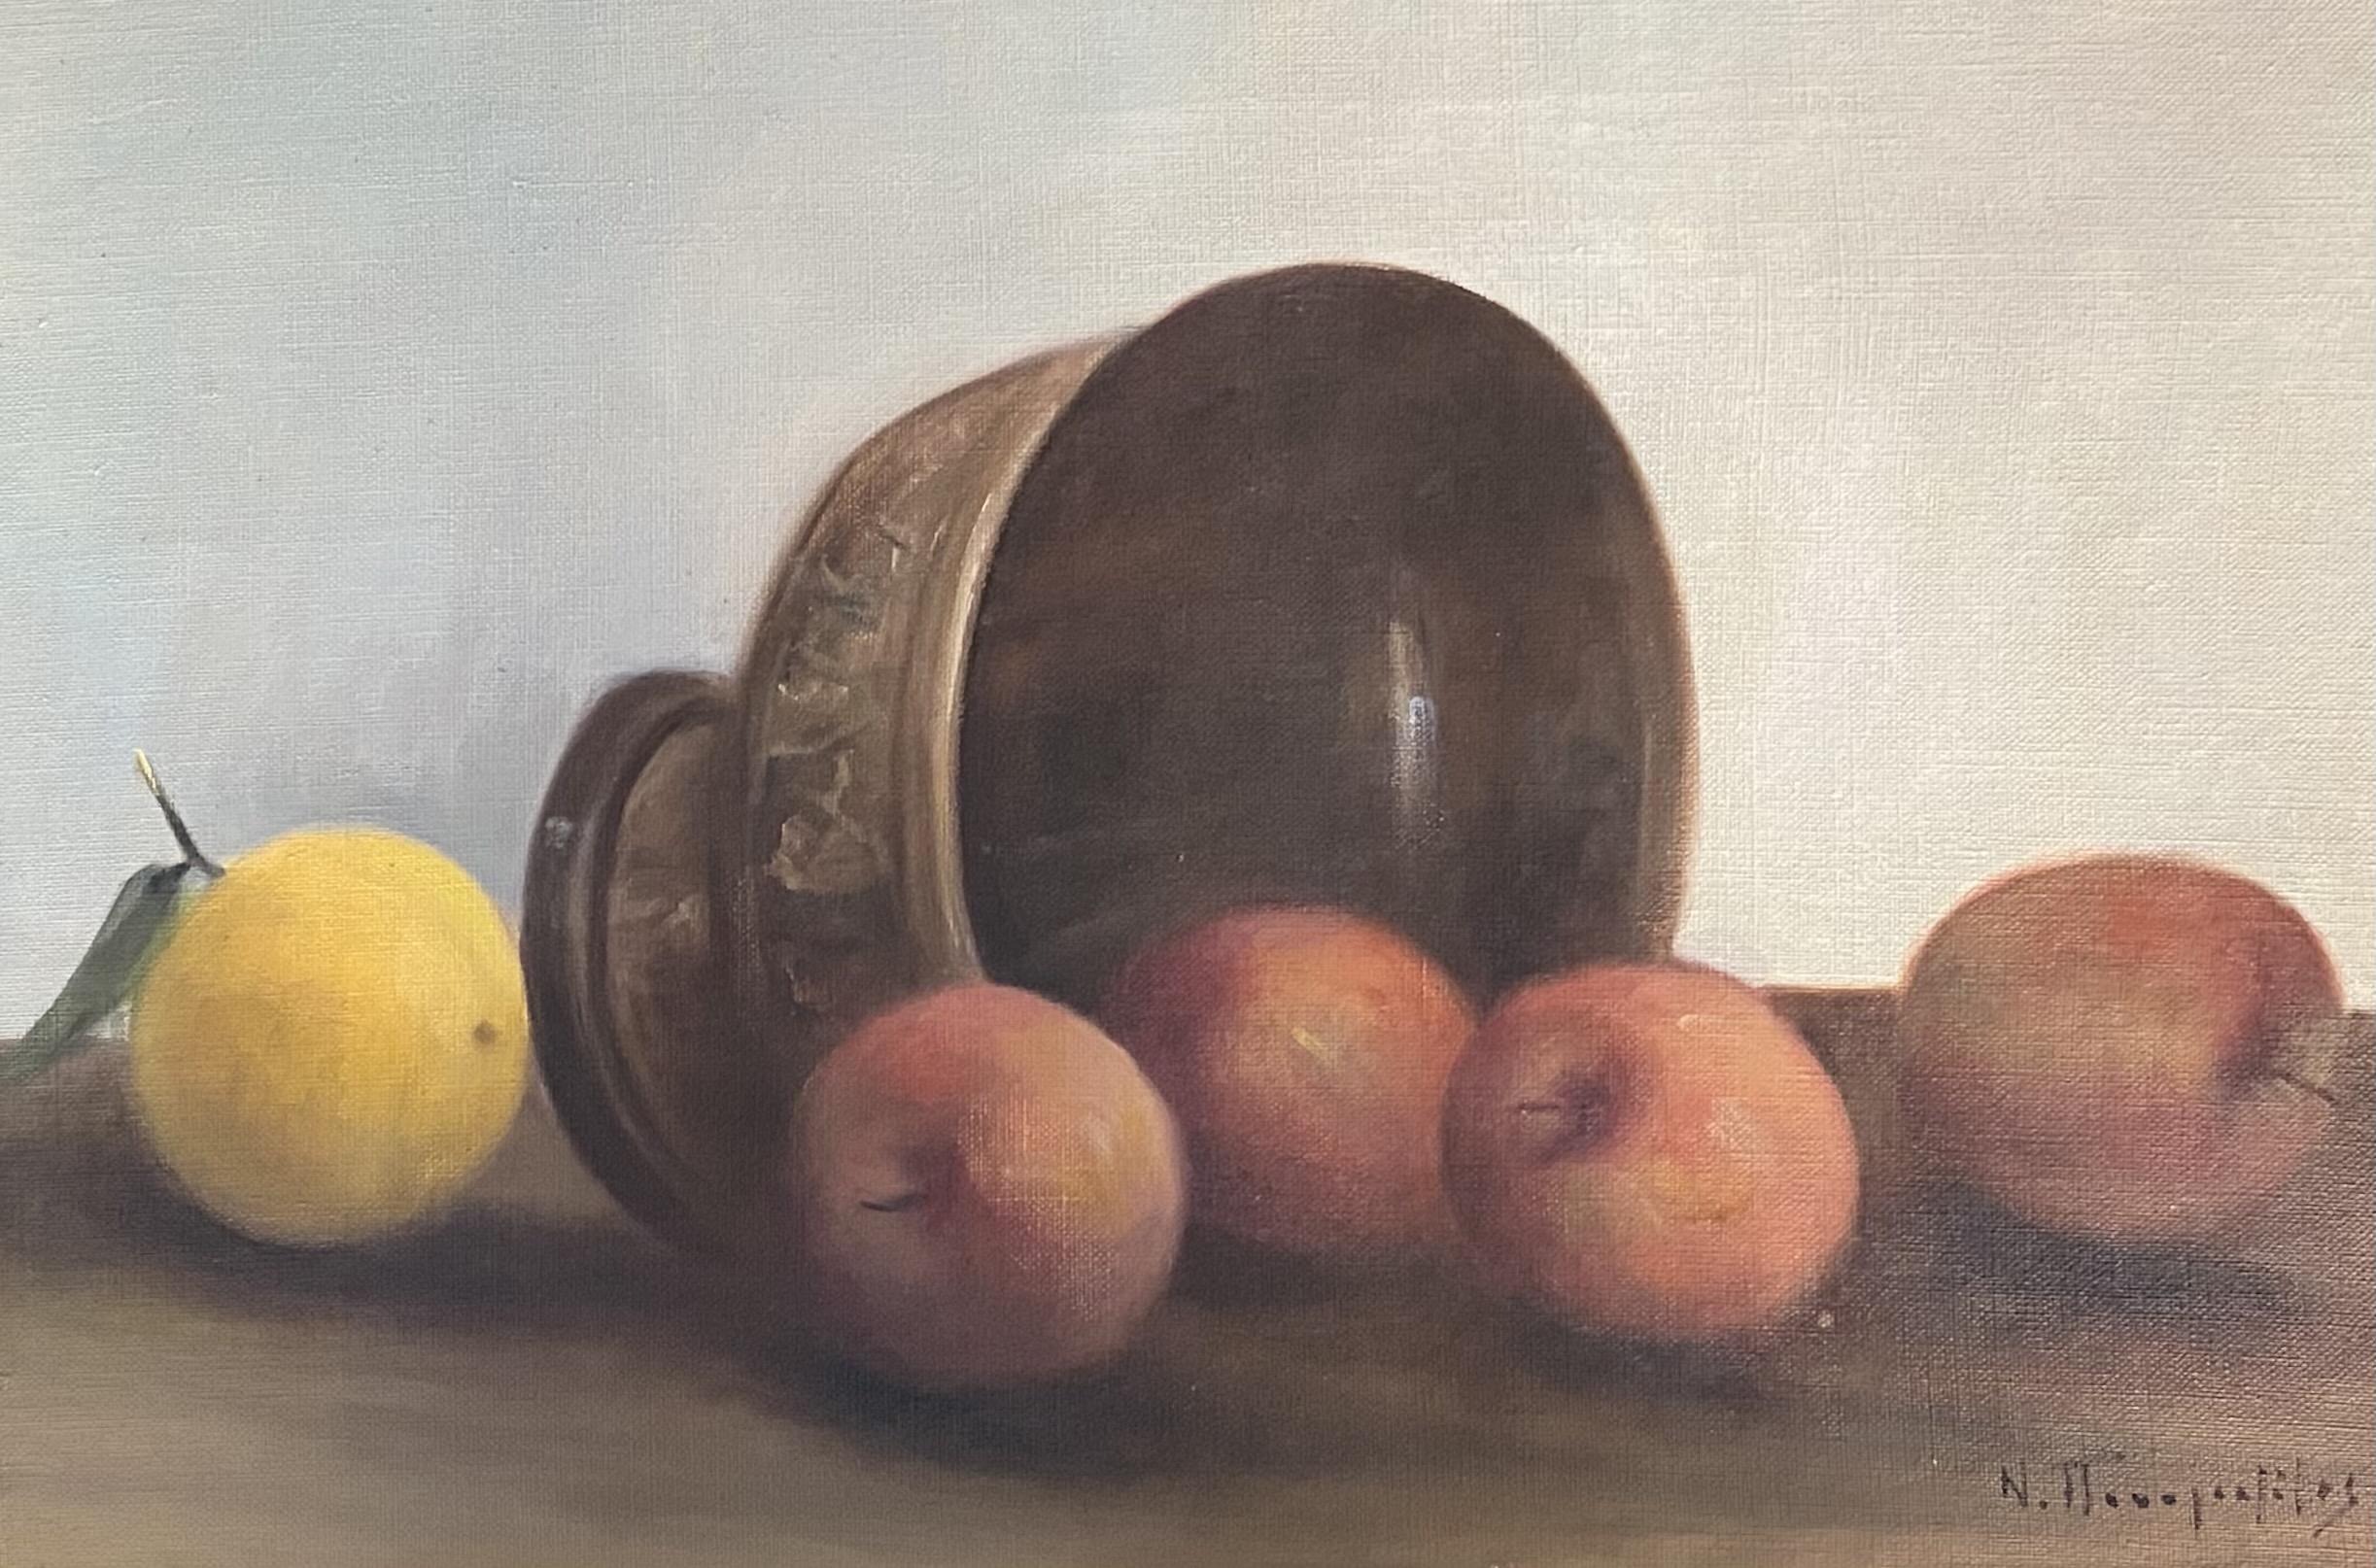 Nikos Panagiotatos (Greek, 1903 - 1983), Still life, oil on canvas, 33 x 48 cm. Loudos Auctions